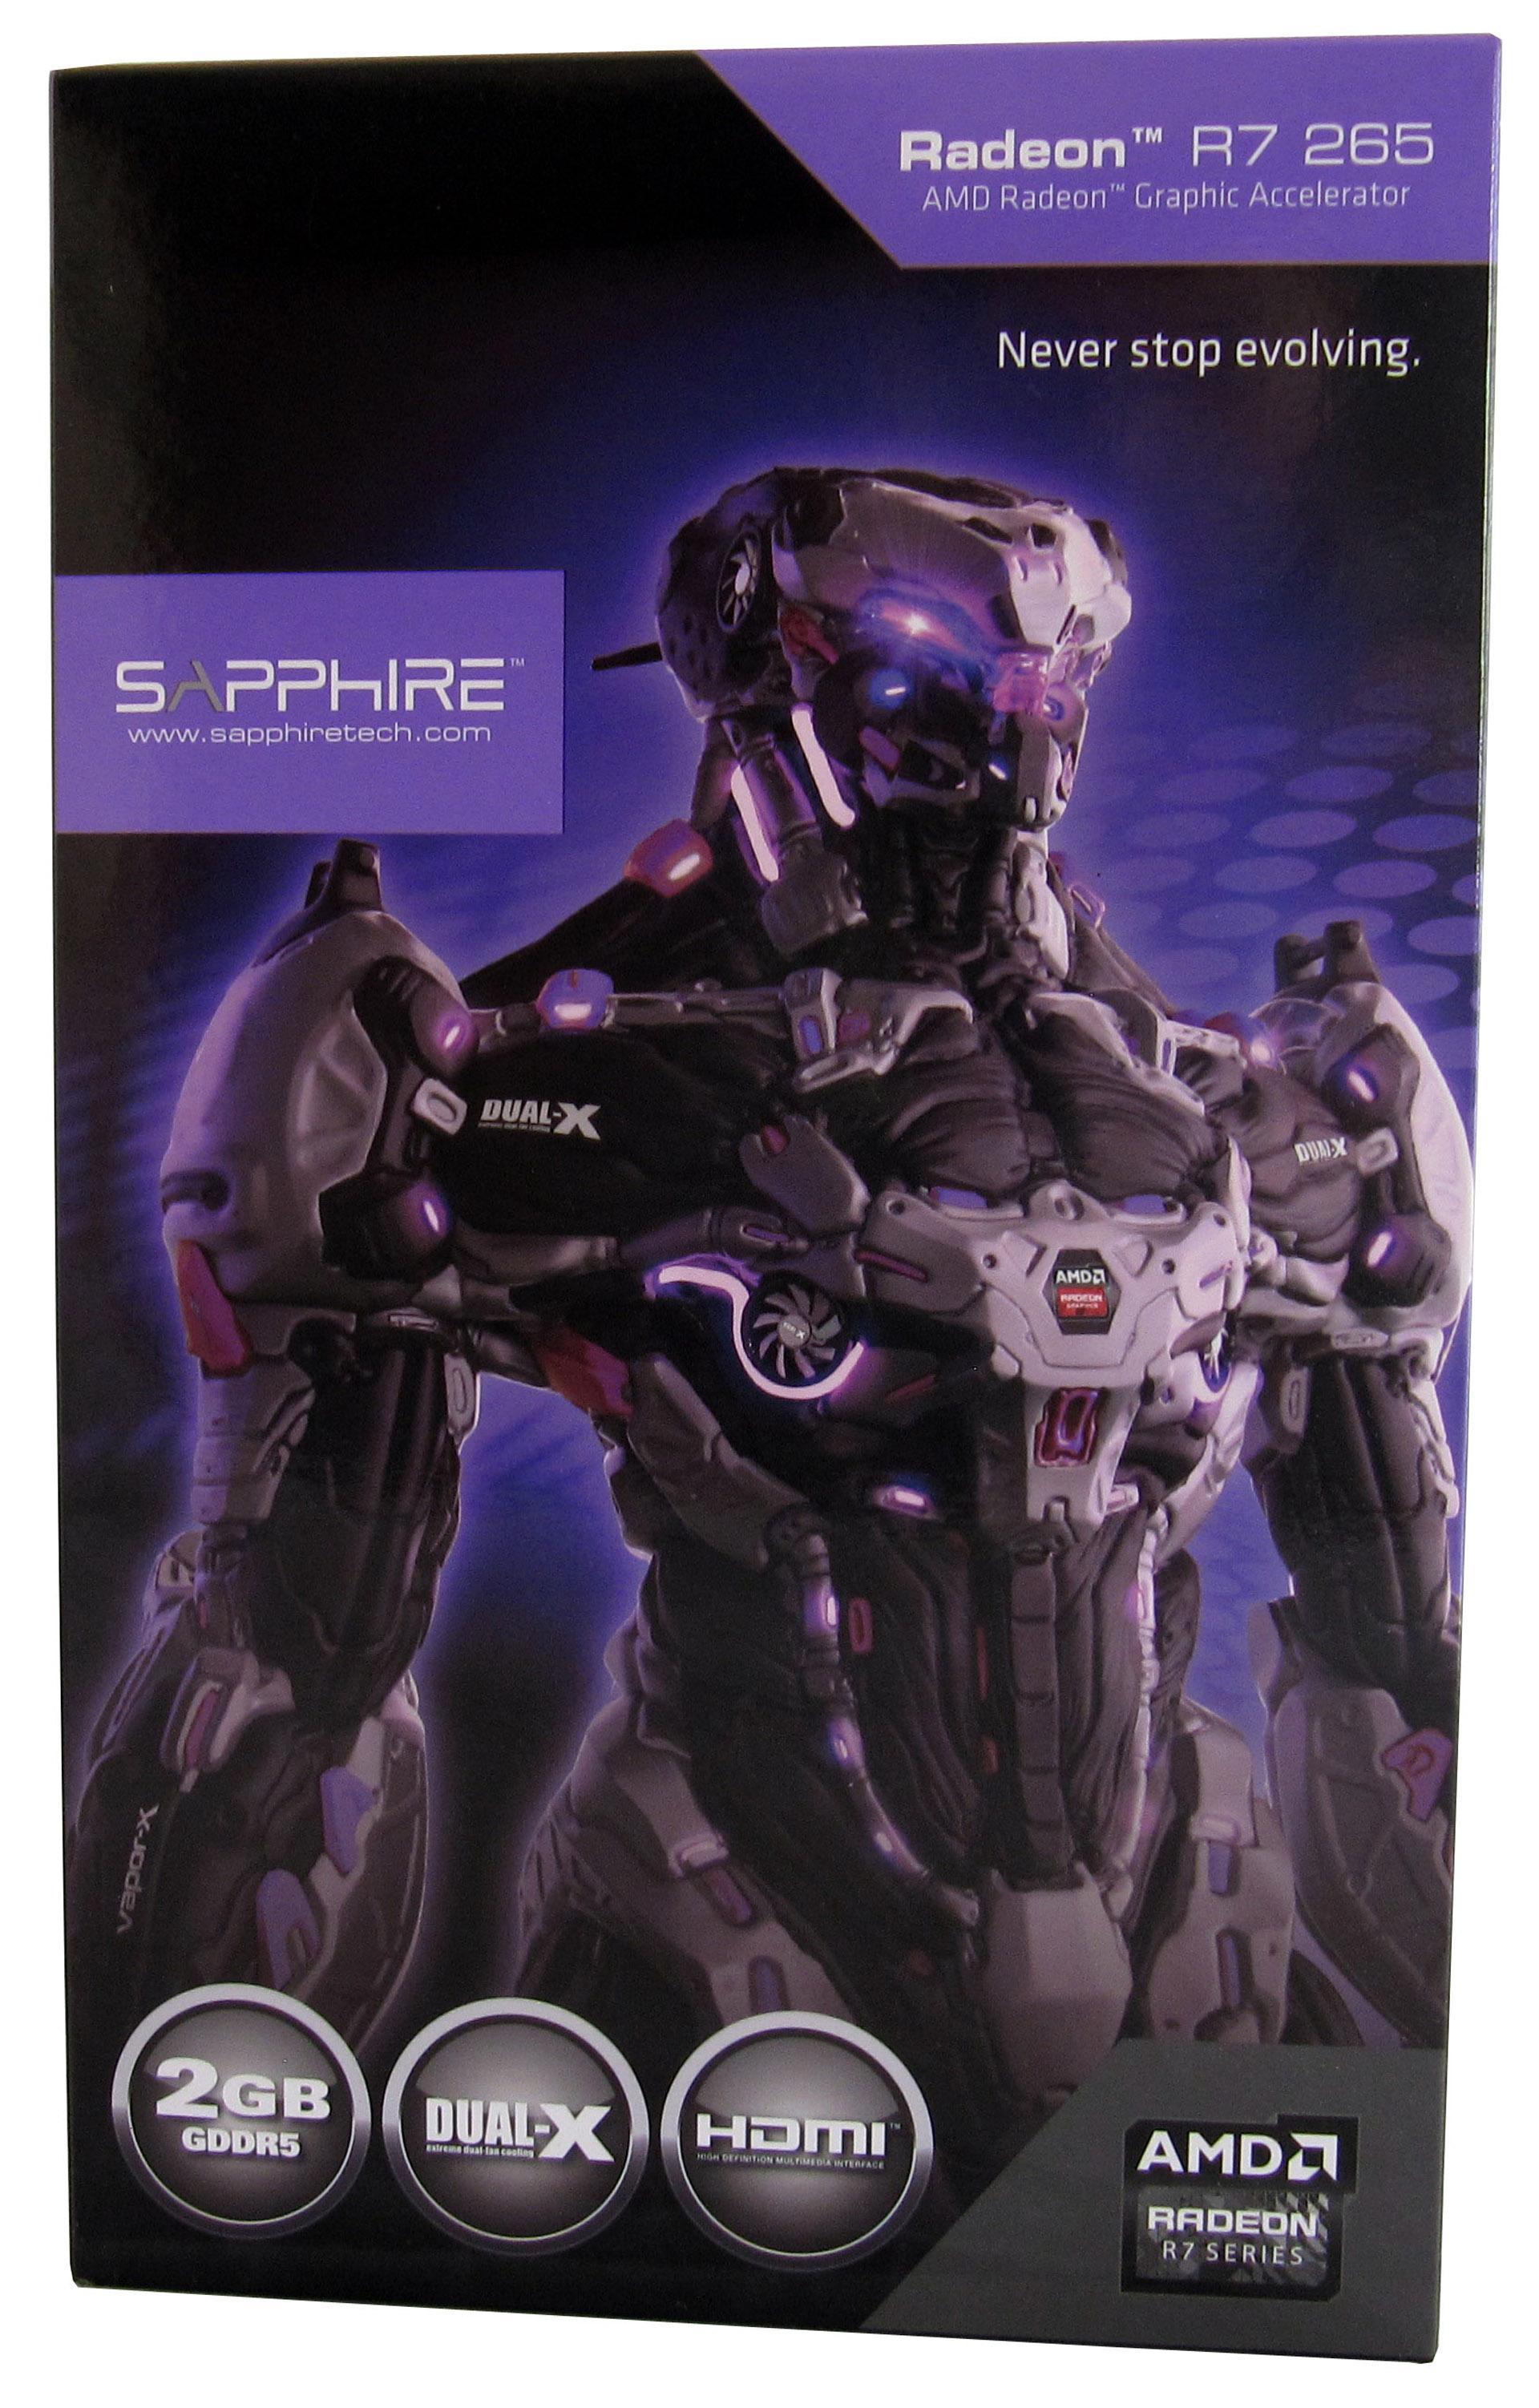 Sapphireov proljetni giveaway 2014